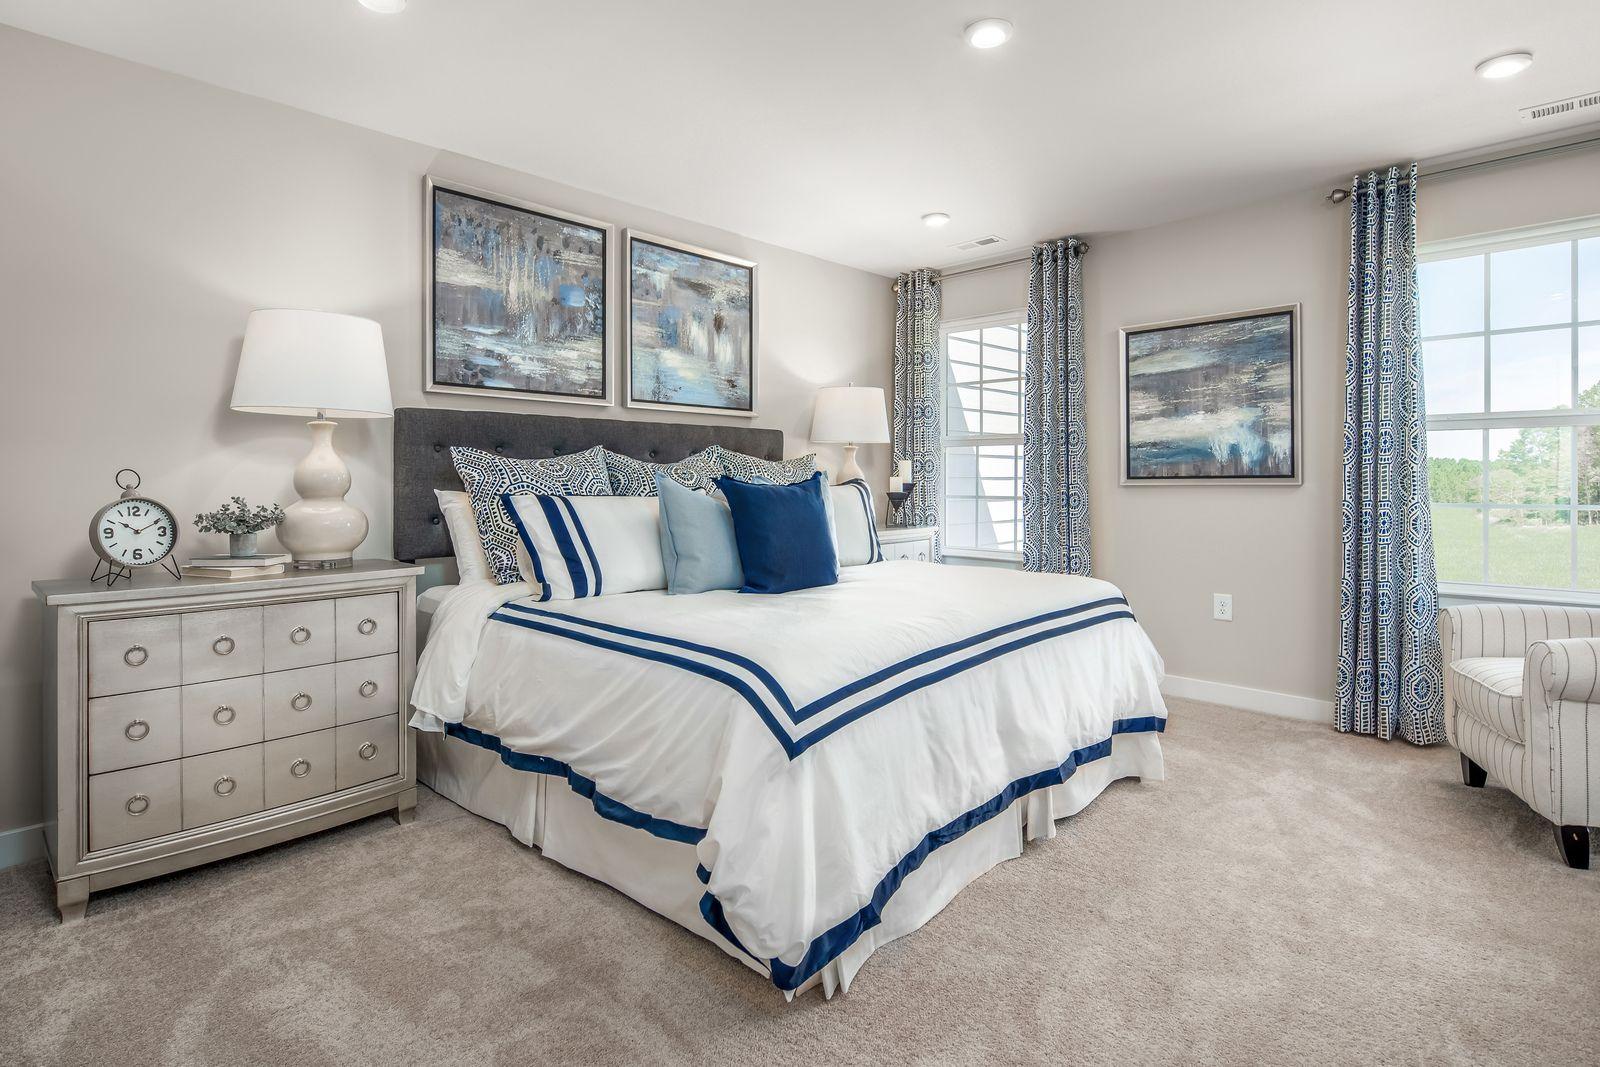 Bedroom featured in the Mendelssohn By Ryan Homes in Washington, VA